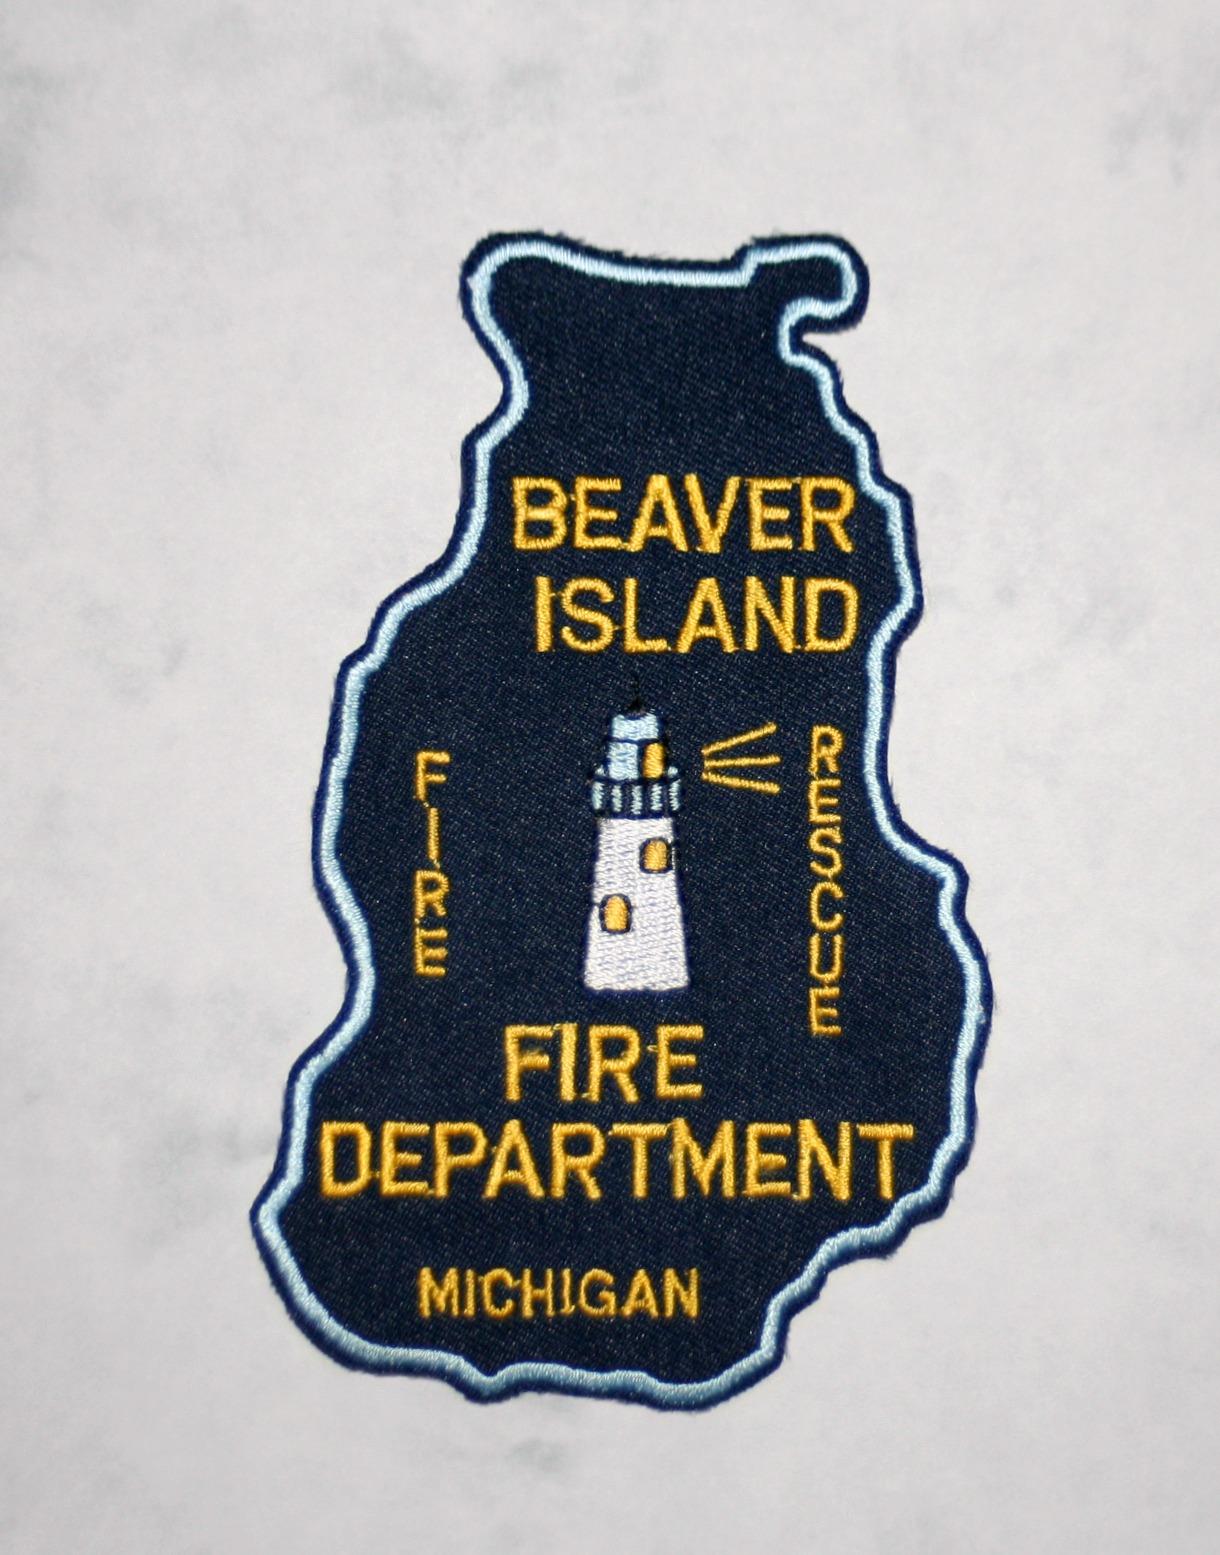 Beaver Island Michigan Fire